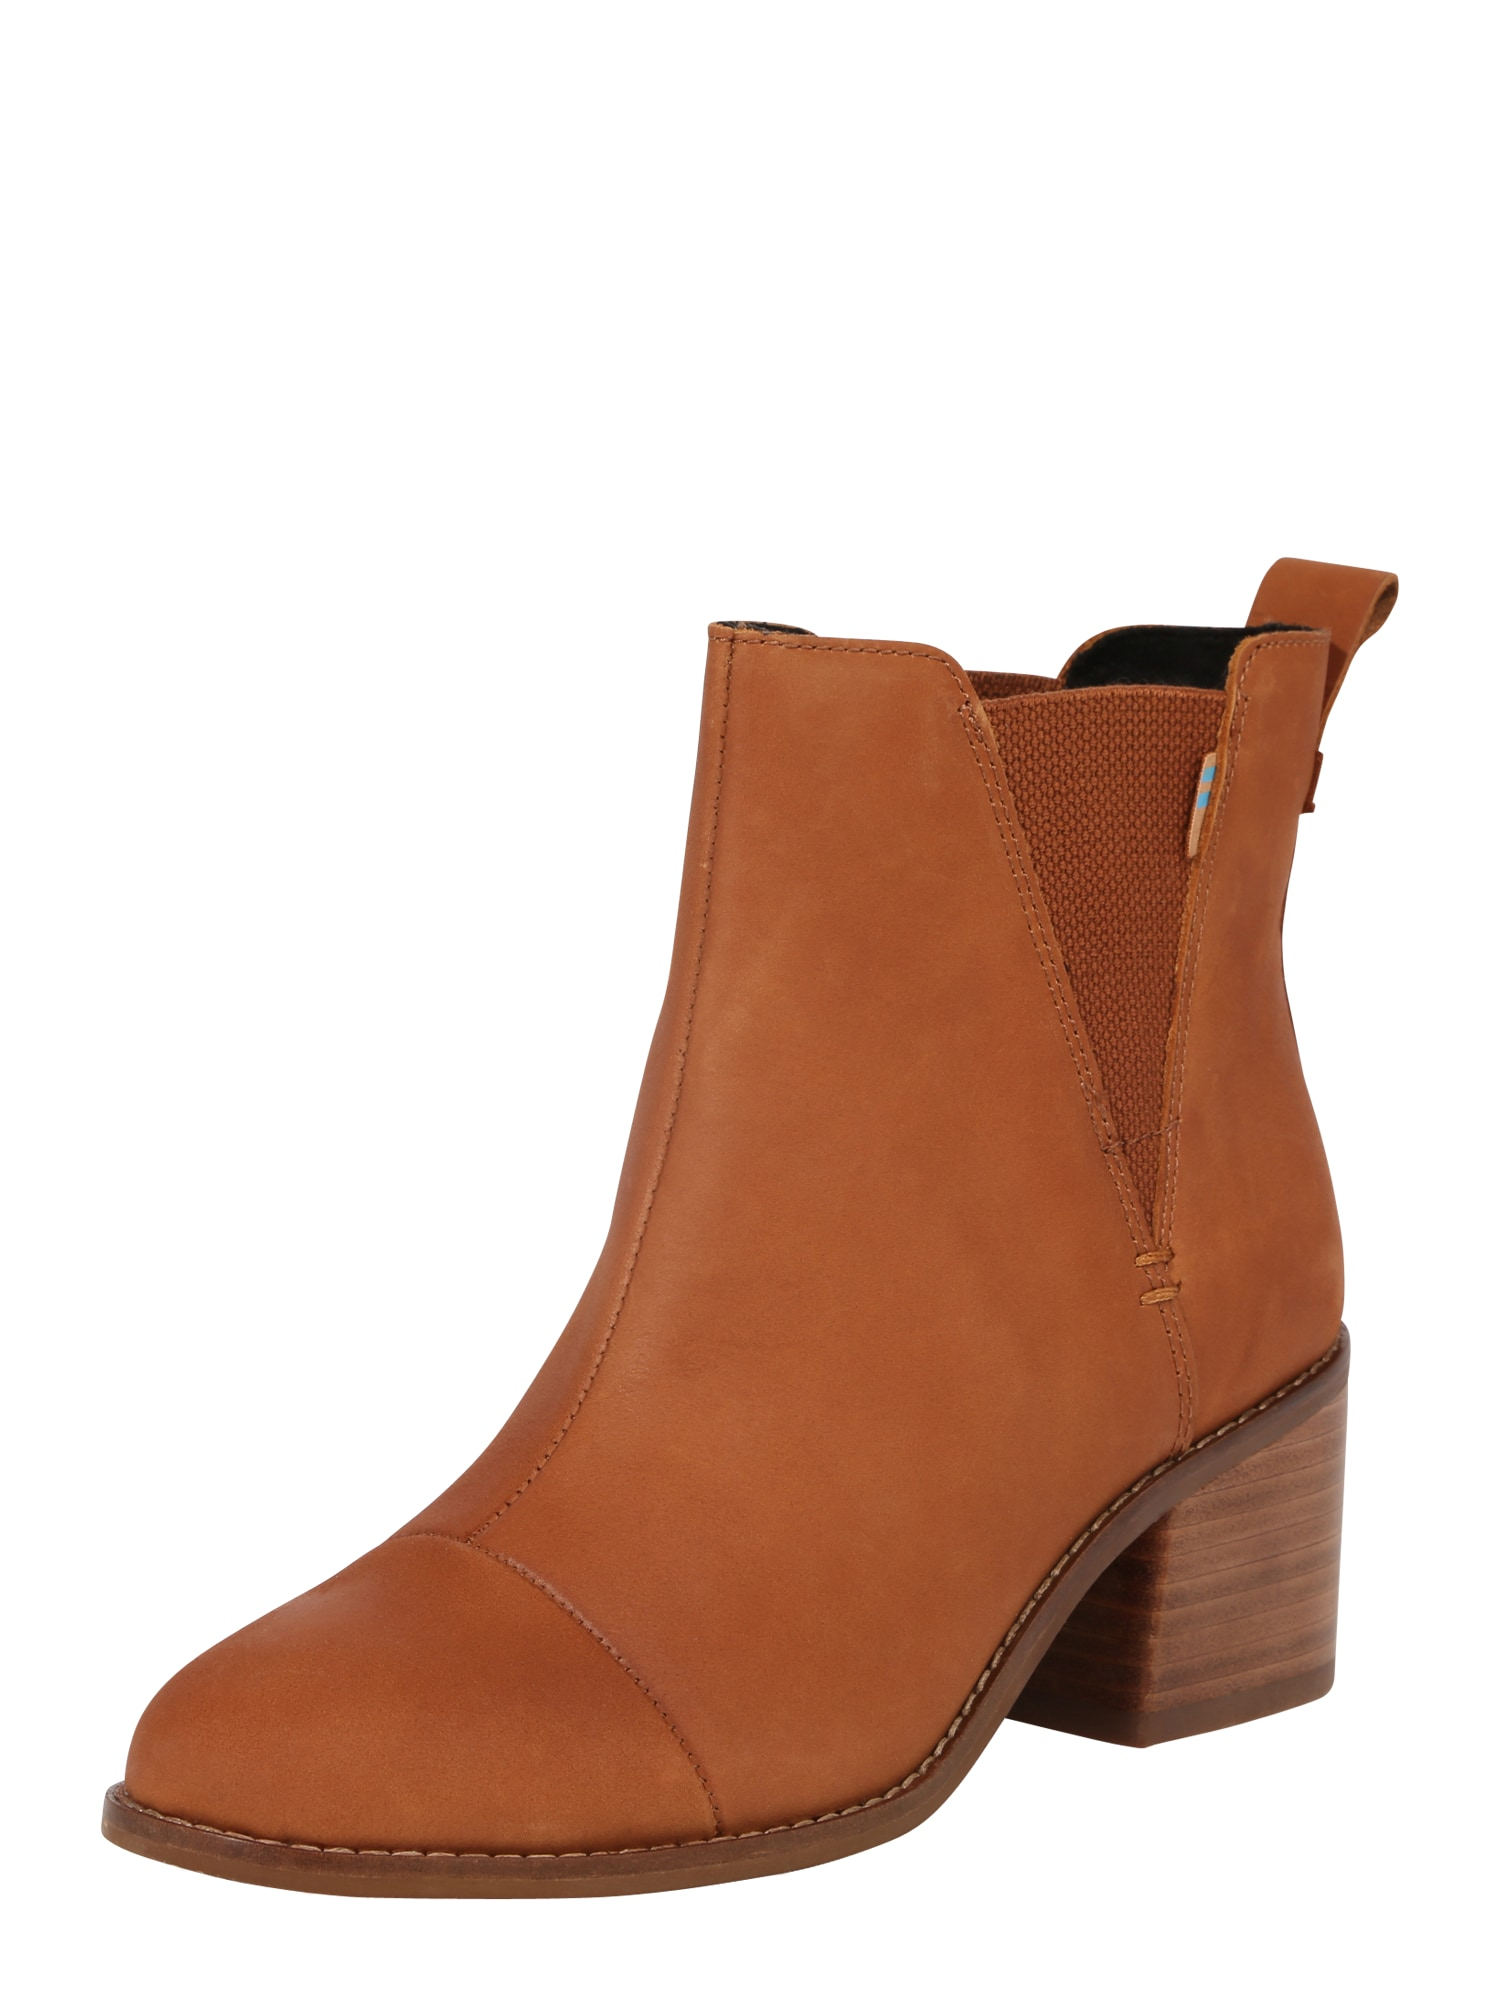 Chelsea boty Esme koňaková TOMS